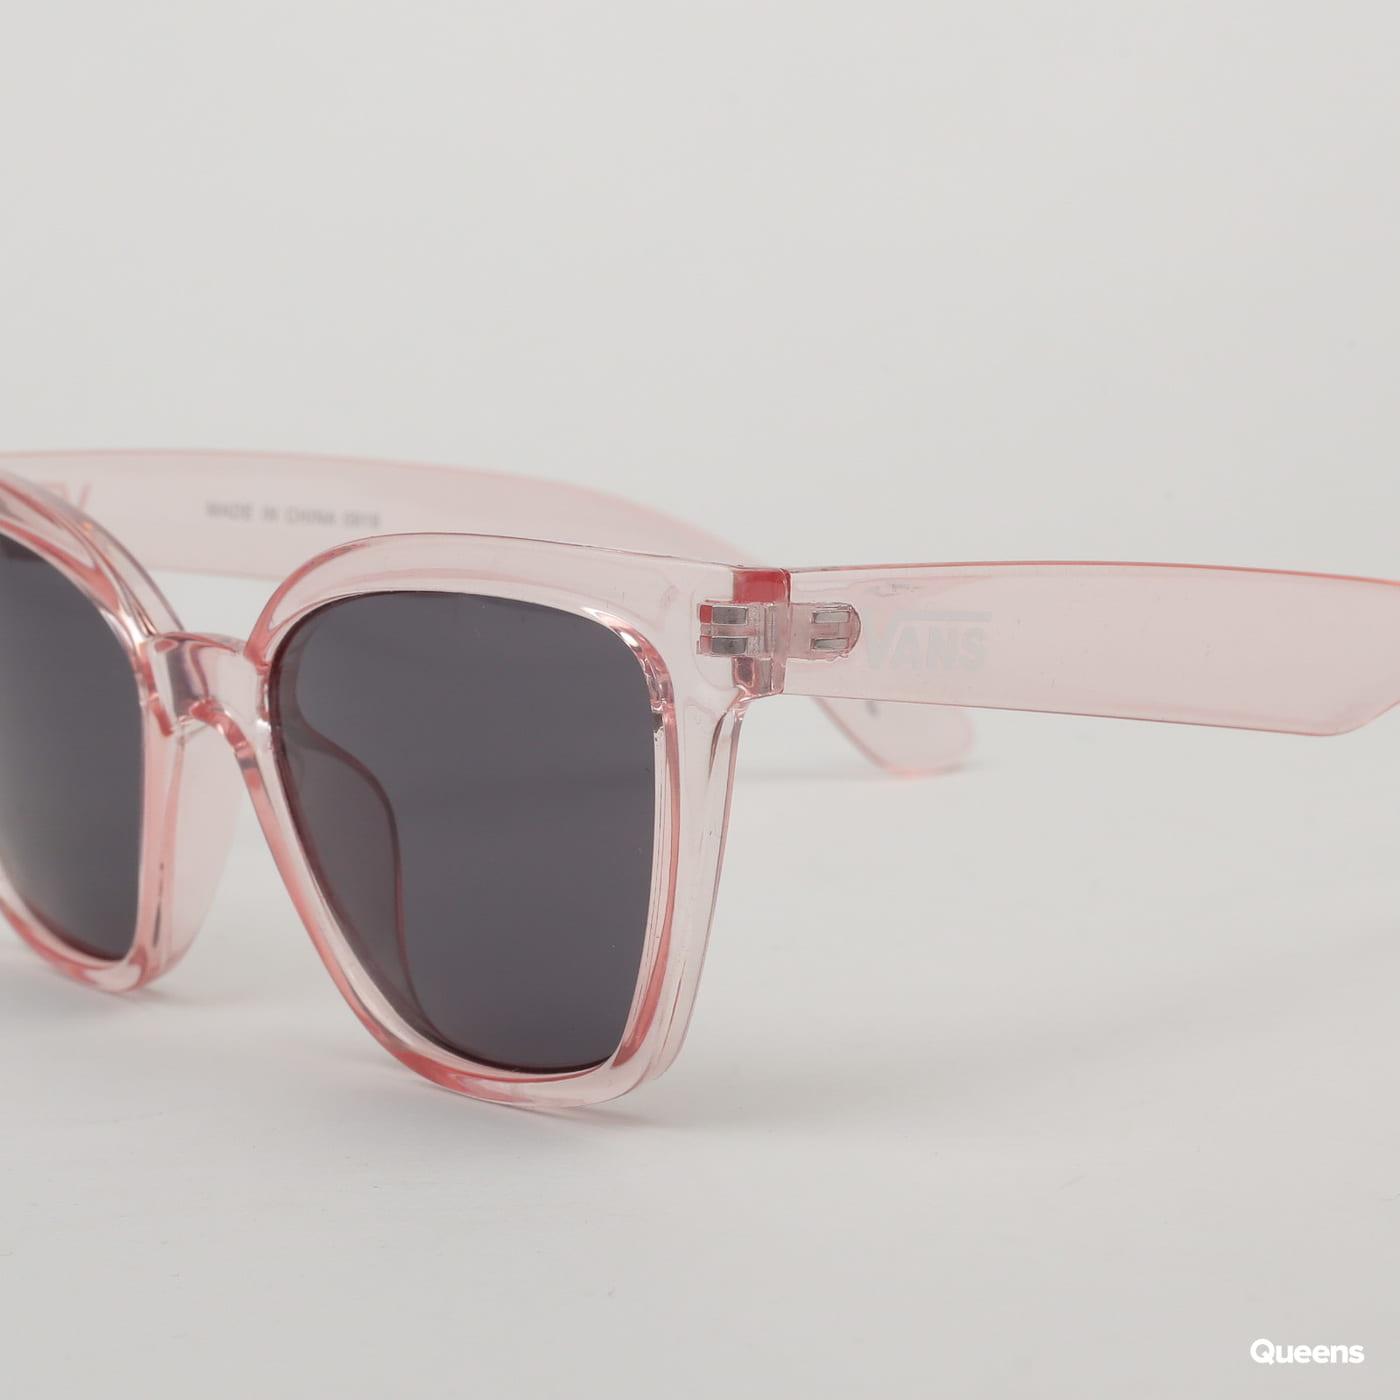 Vans WM Hip Cat Sunglasses hellrosa / schwarz